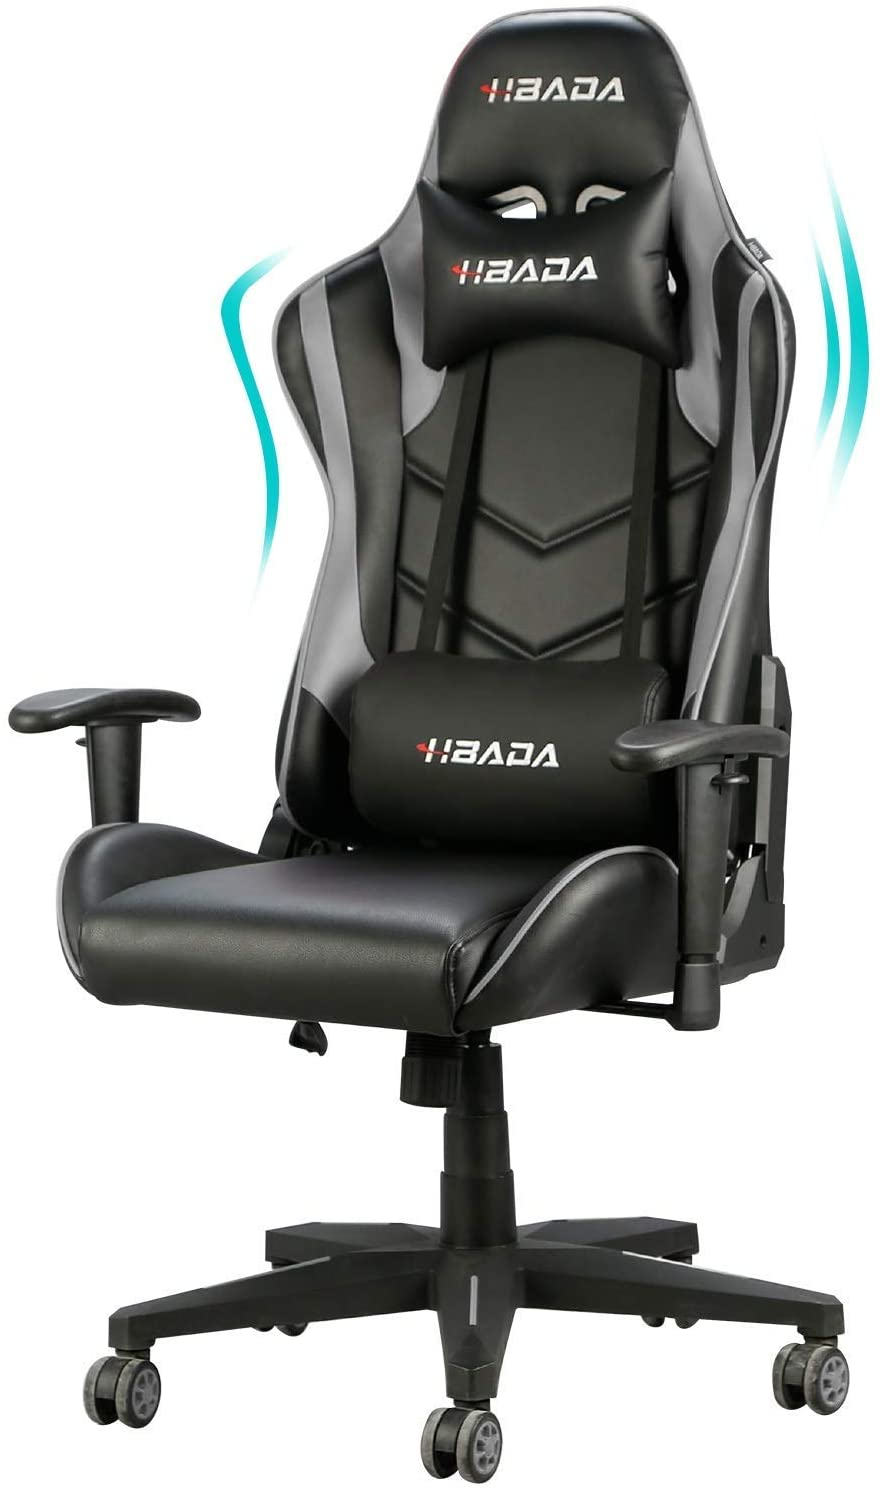 Hbada Racing Style Gaming Chair